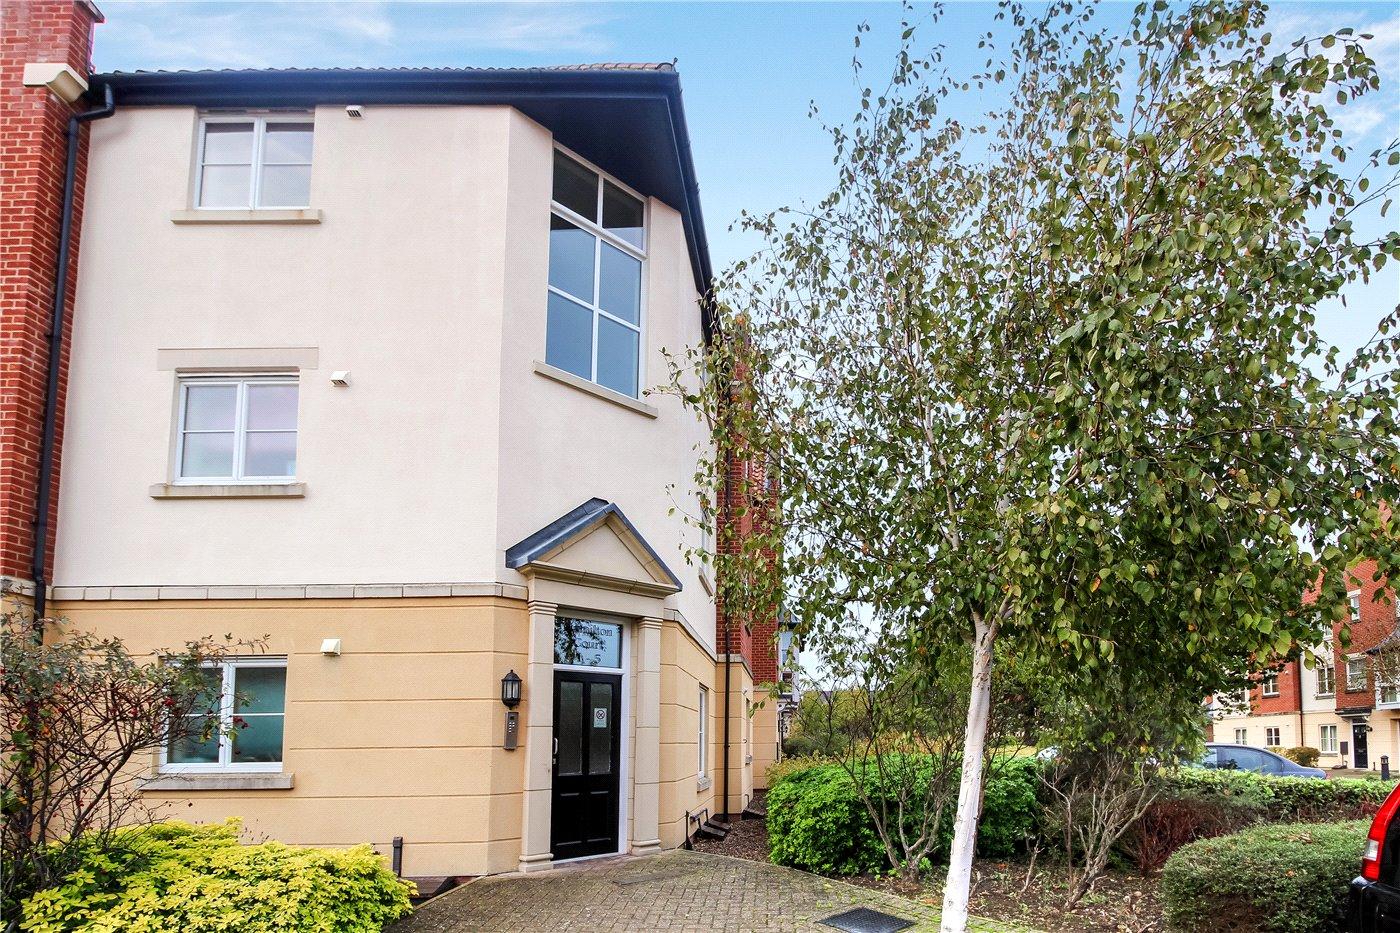 2 bedroom property for sale in Hamilton Court, Trafalgar